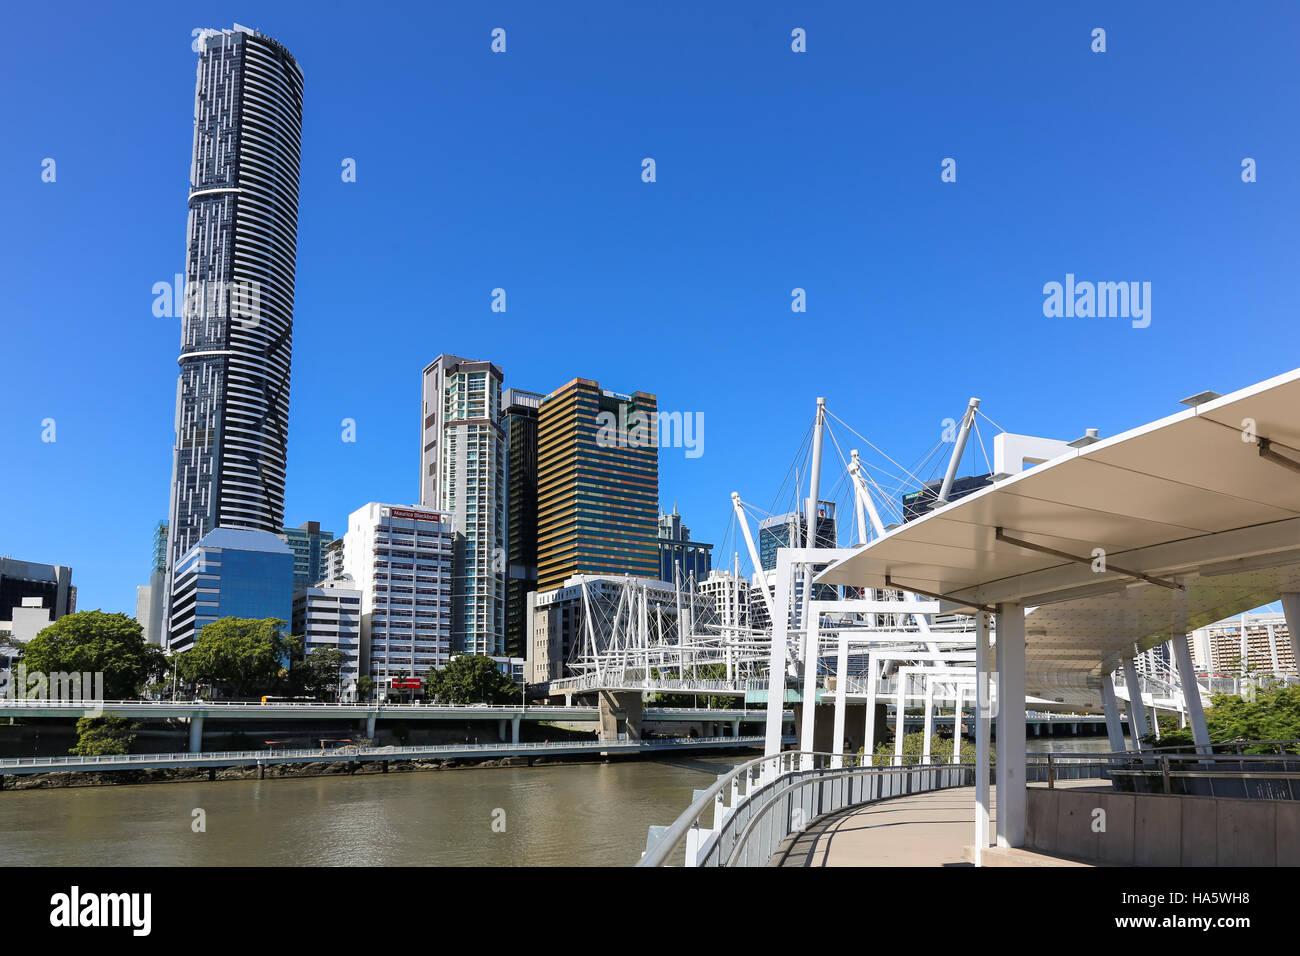 BRISBANE, AUSTRALIA - September 28, 2016: The Kurilpa footbridge links the Roma Street area of the CBD with Brisbane's - Stock Image